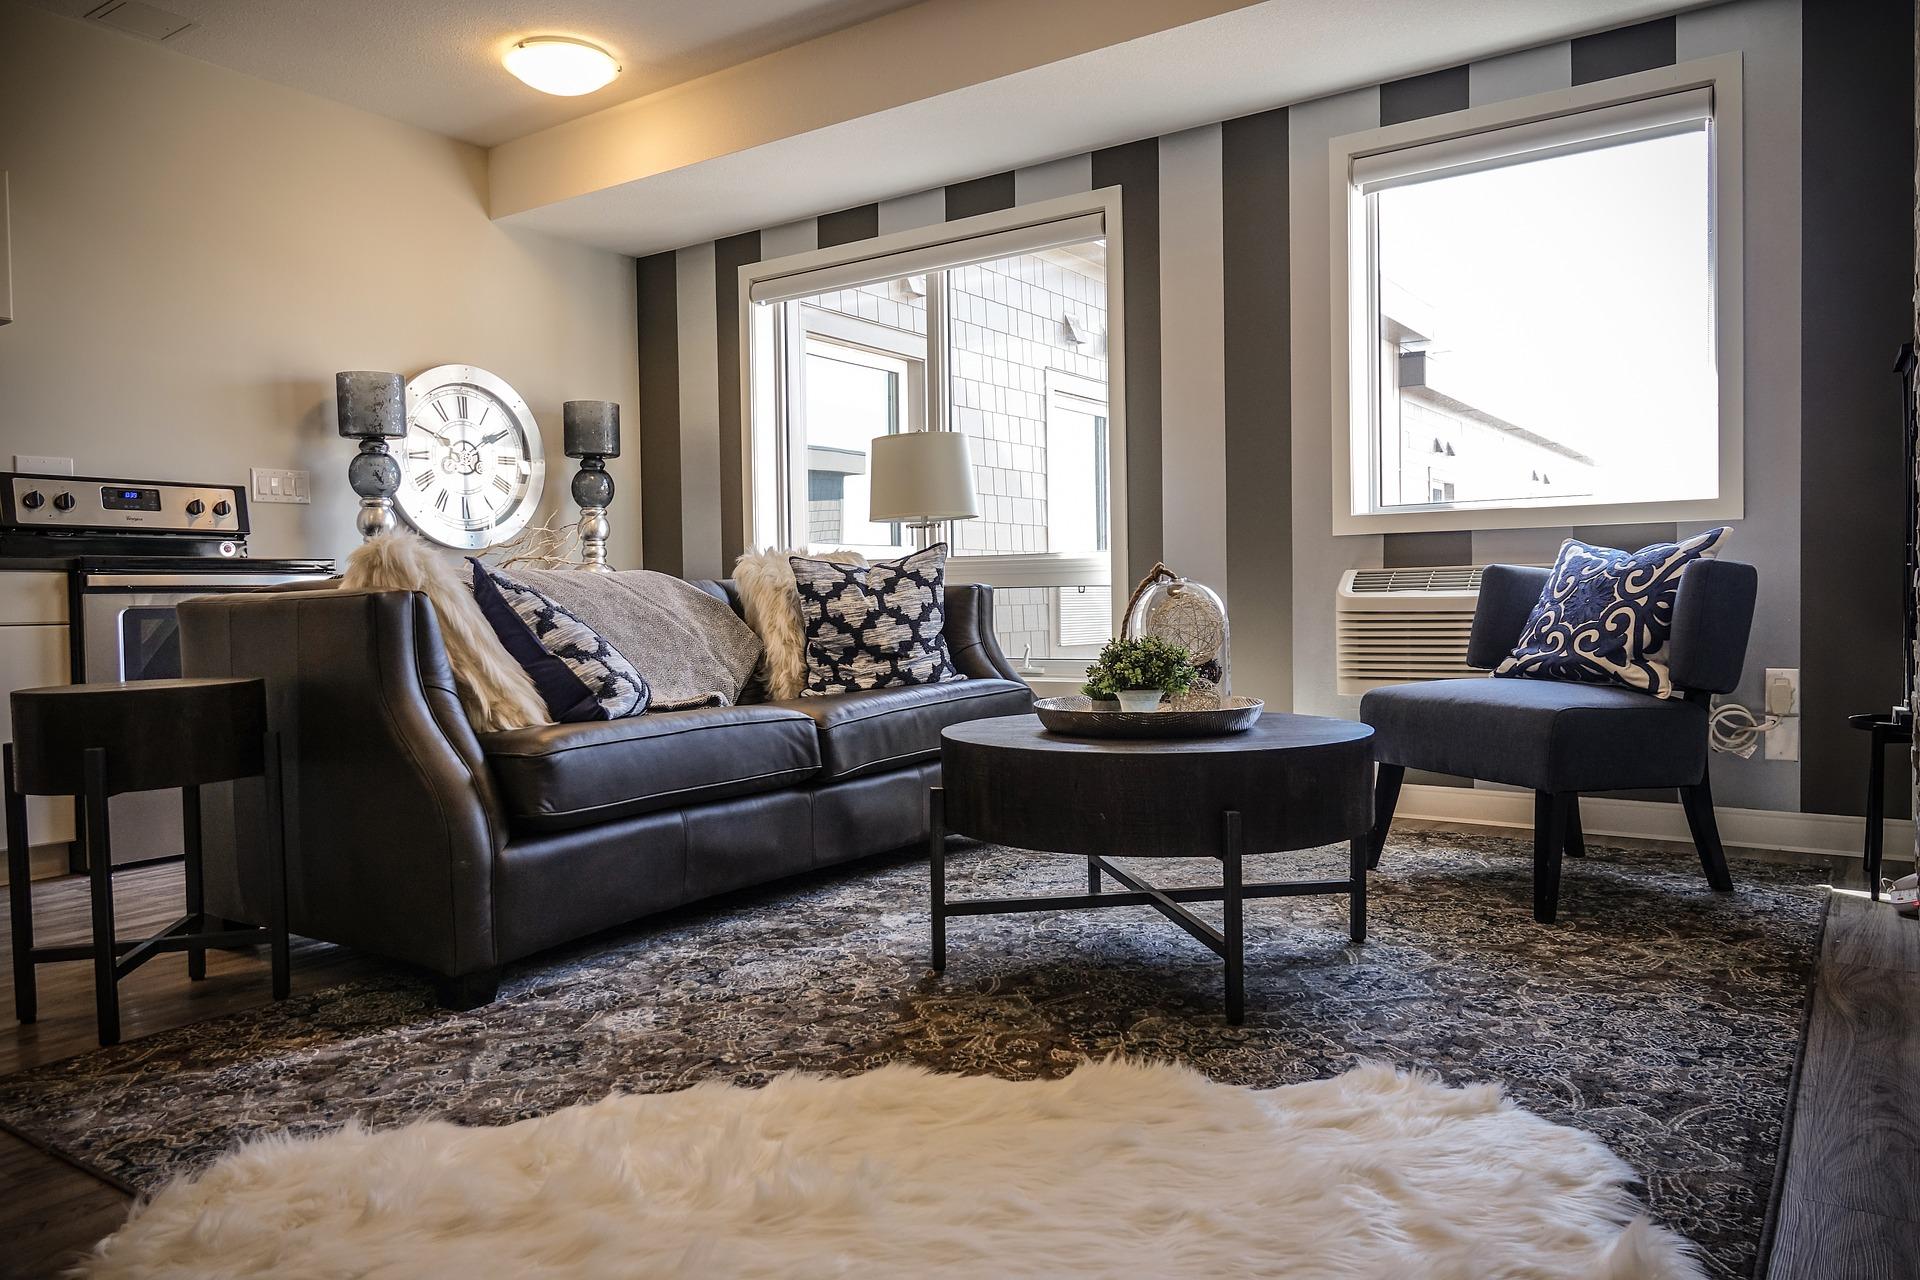 living-room-3498915_1920